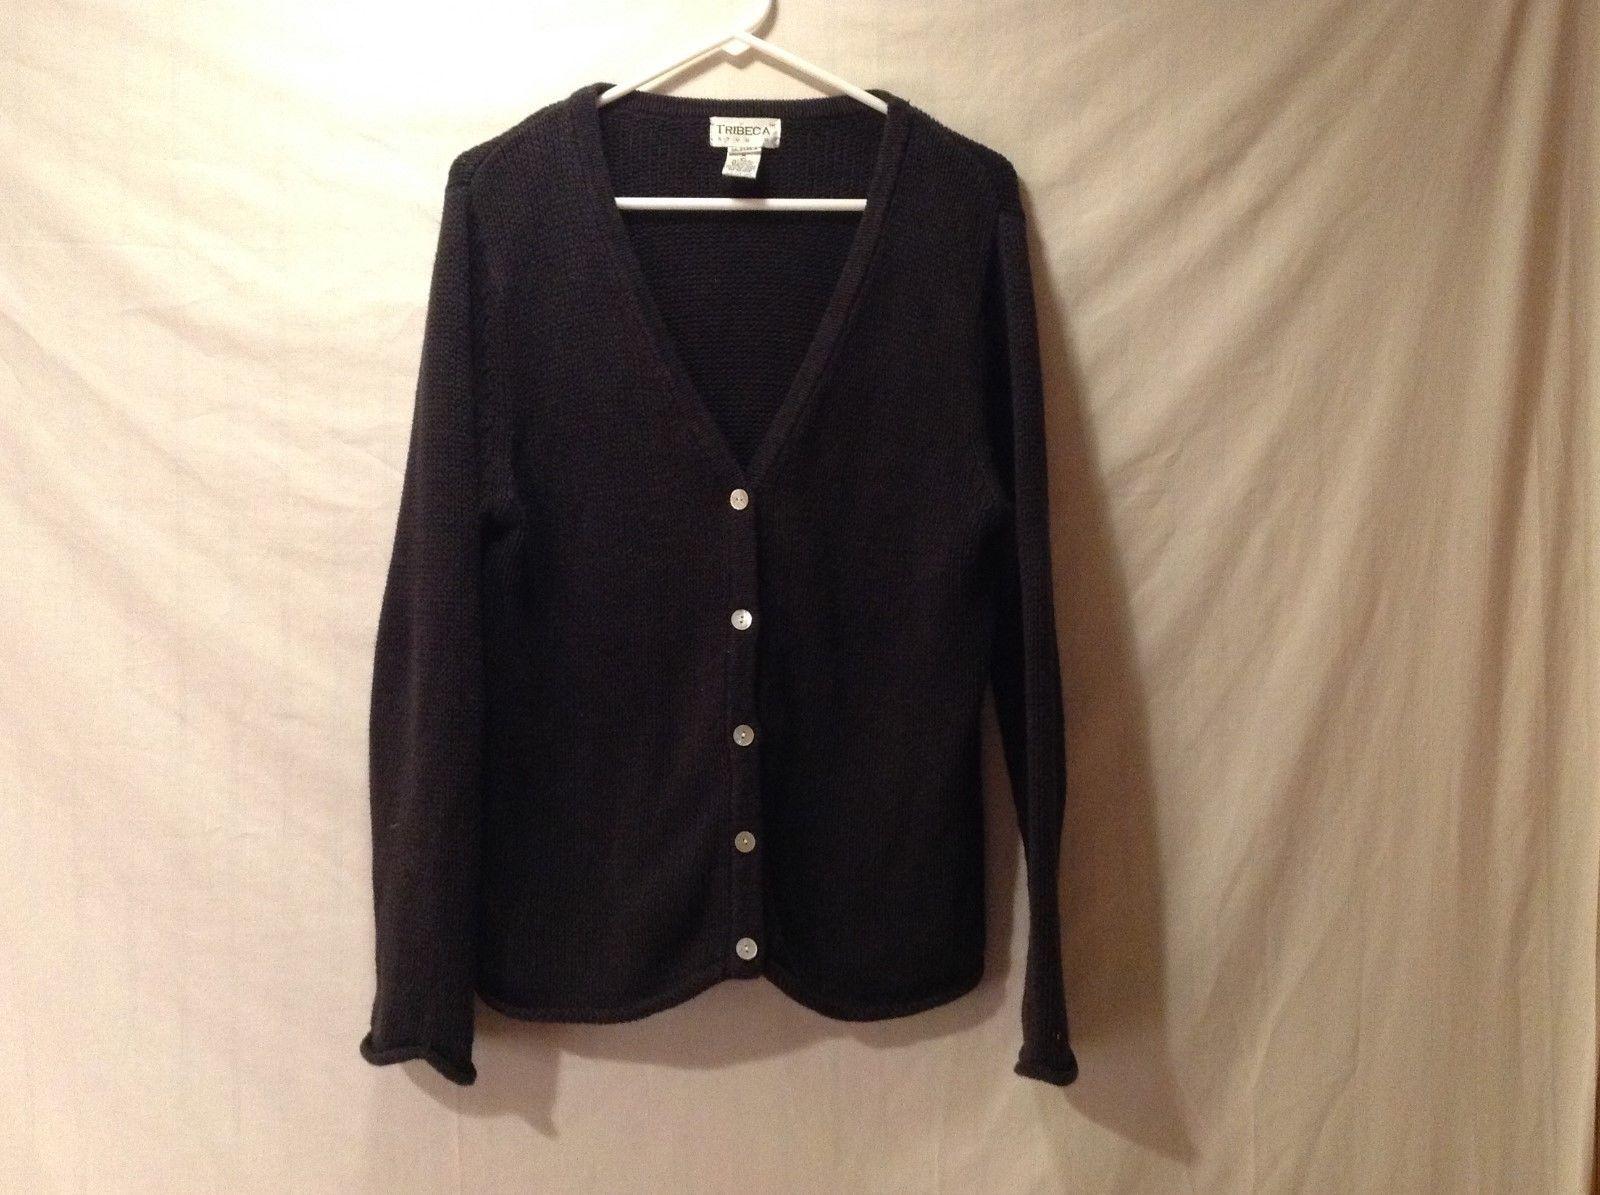 Tribeca Studio Women's Navy Blue V-neck Knit Sweater Cartigan